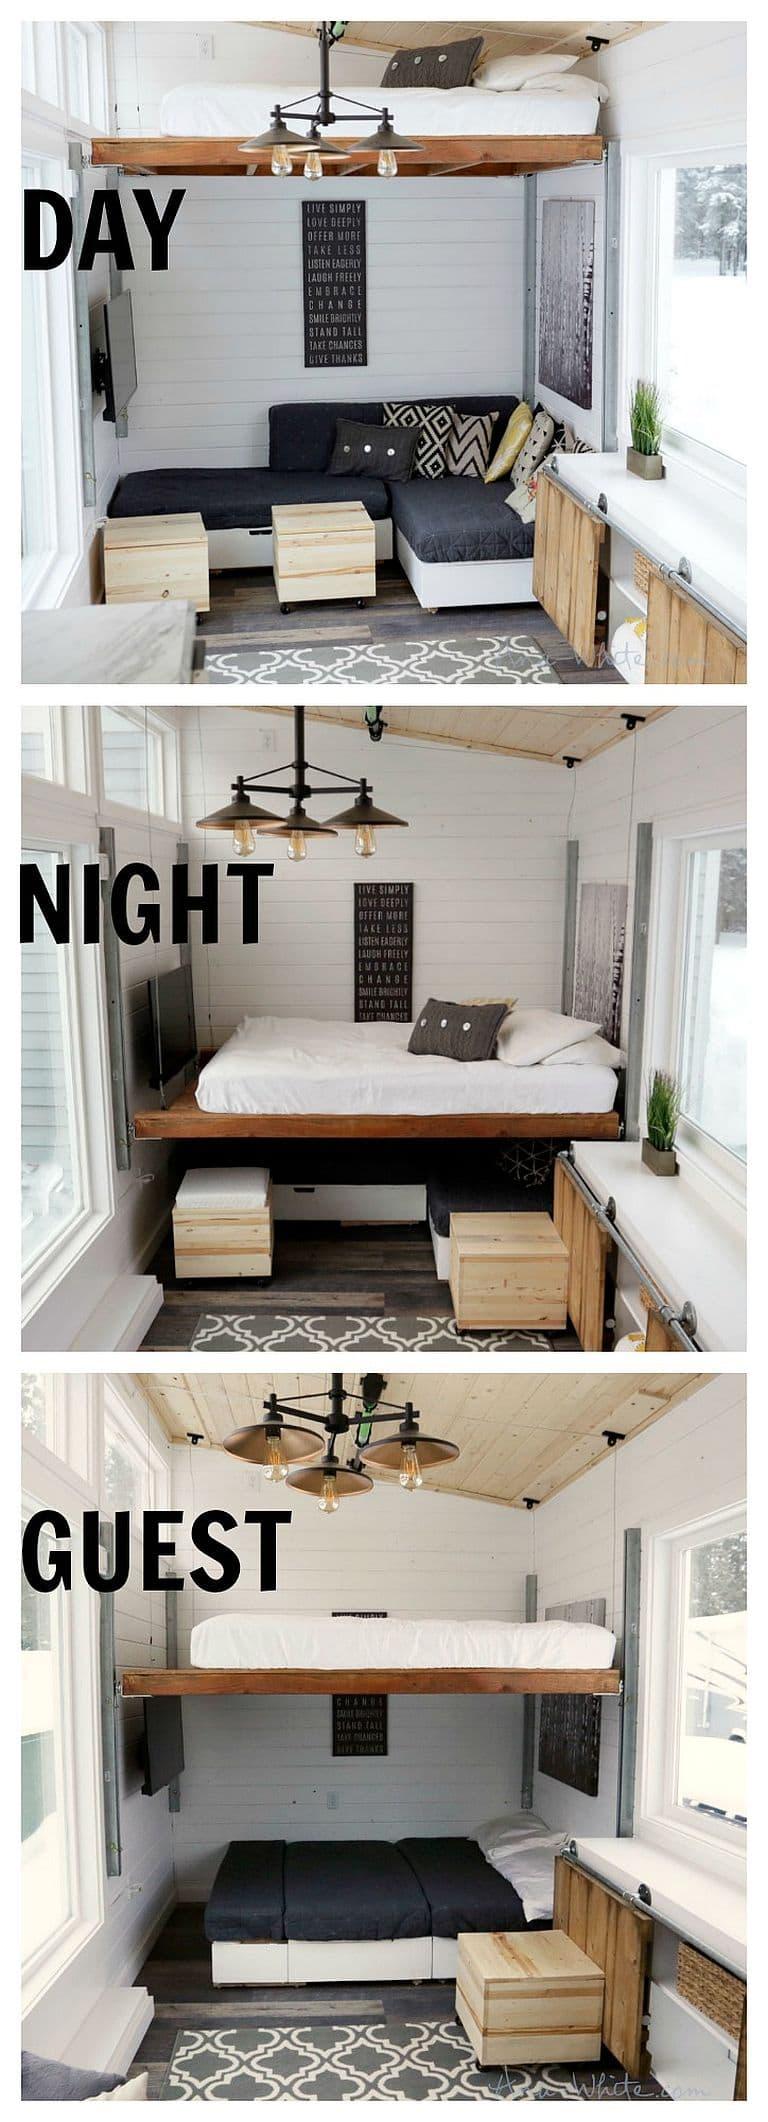 Homemade Elevator Bed Highlights Diy Blogger Ana White S